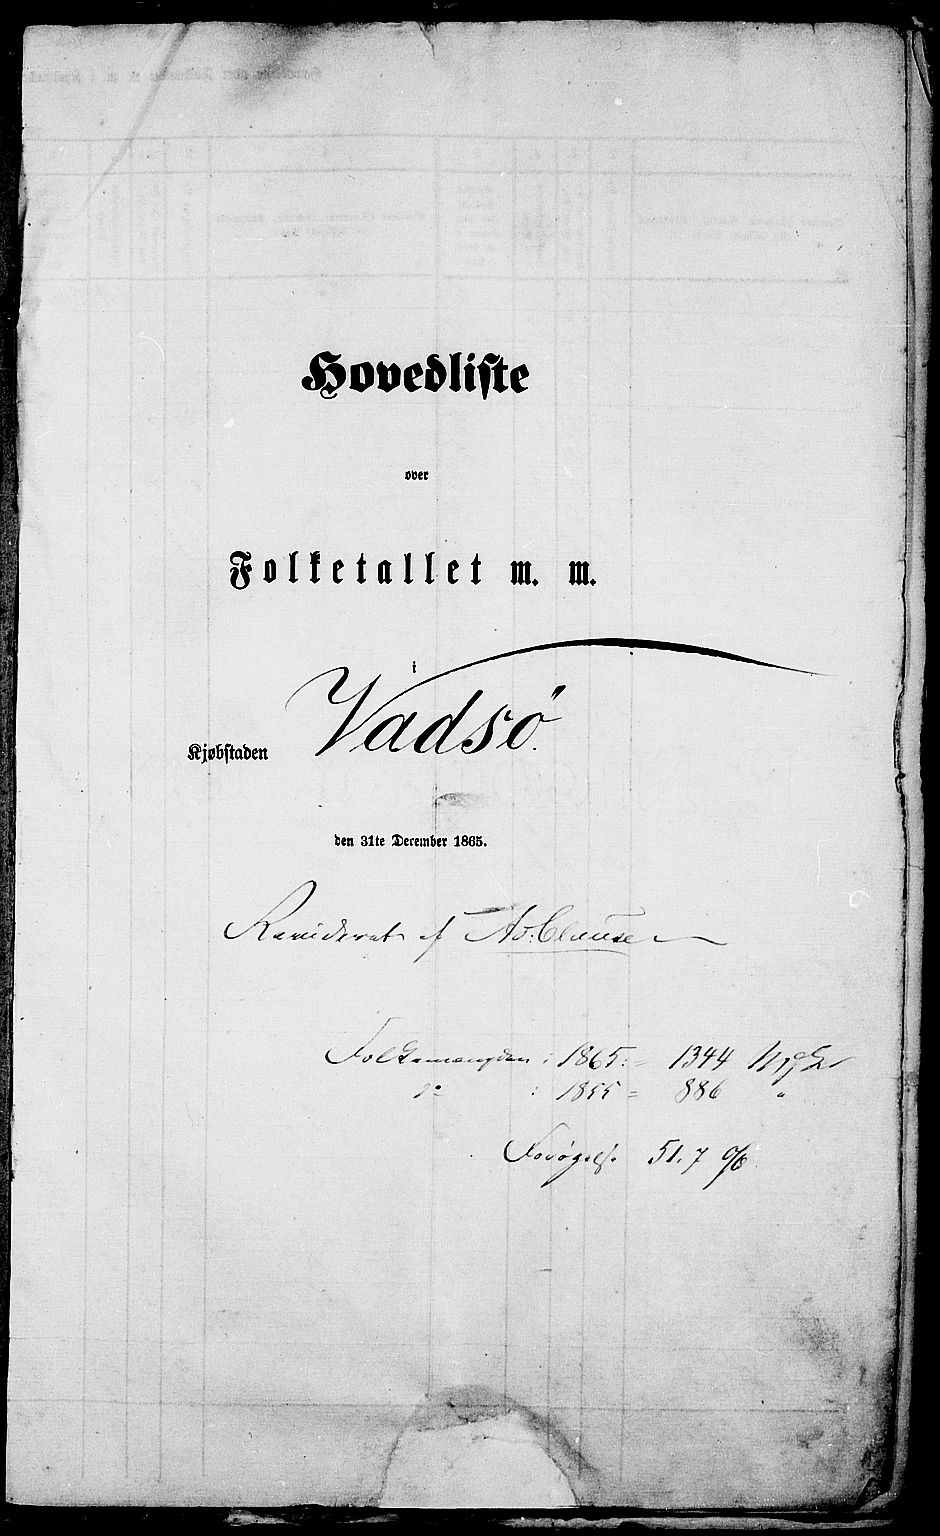 RA, 1865 census for Vadsø/Vadsø, 1865, p. 4